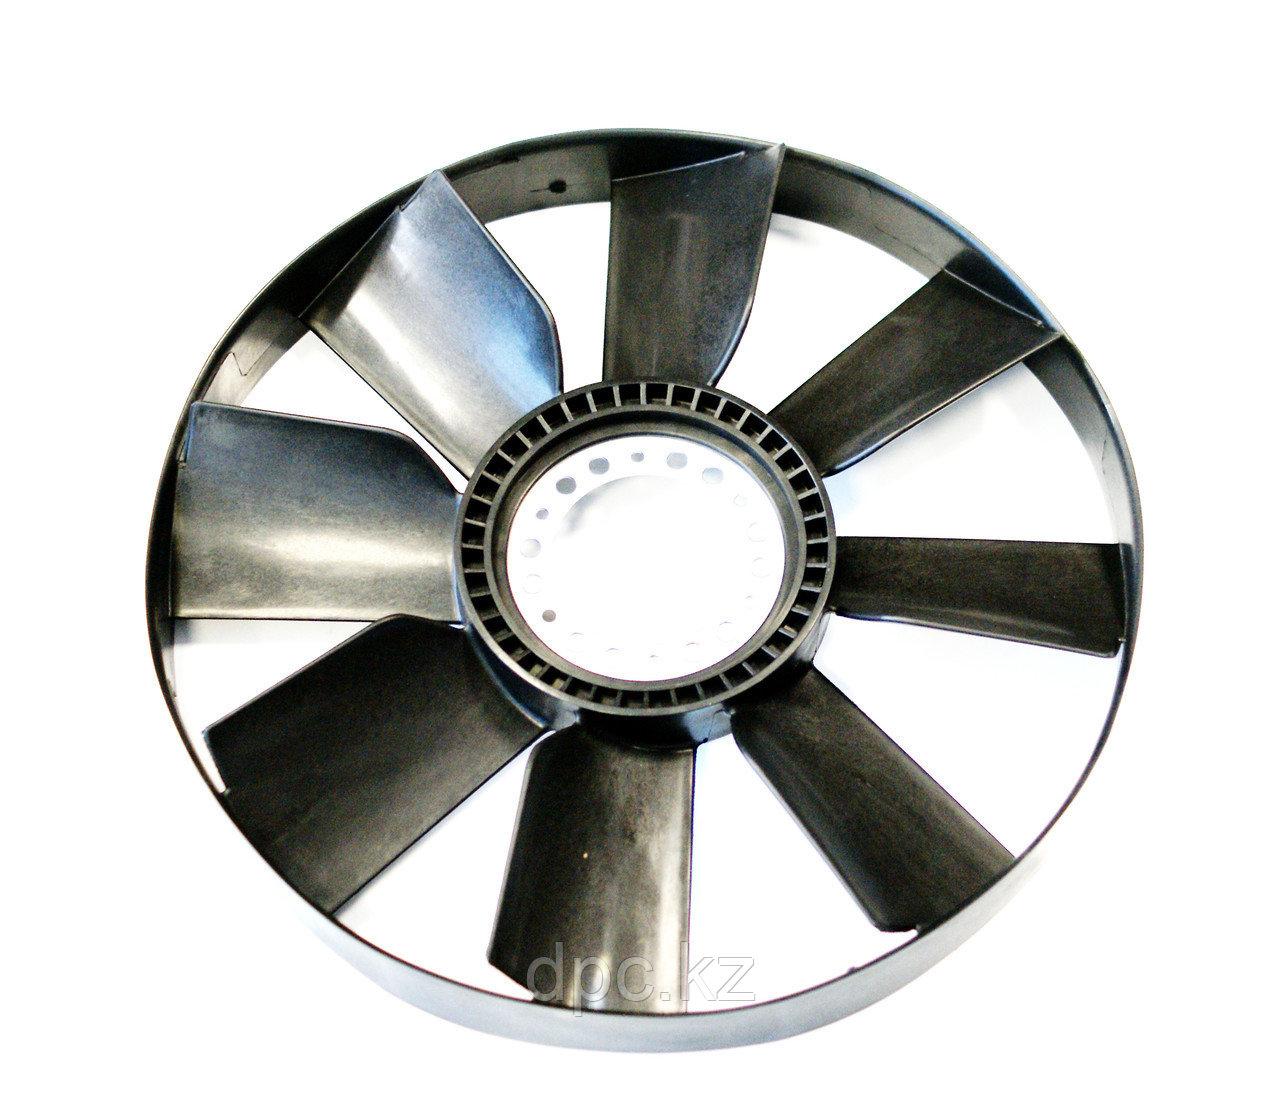 Крыльчатка вентилятора D-654 для Cummins ISBe КАМАЗ 740.30-260, 740.30, 740.31 020002743